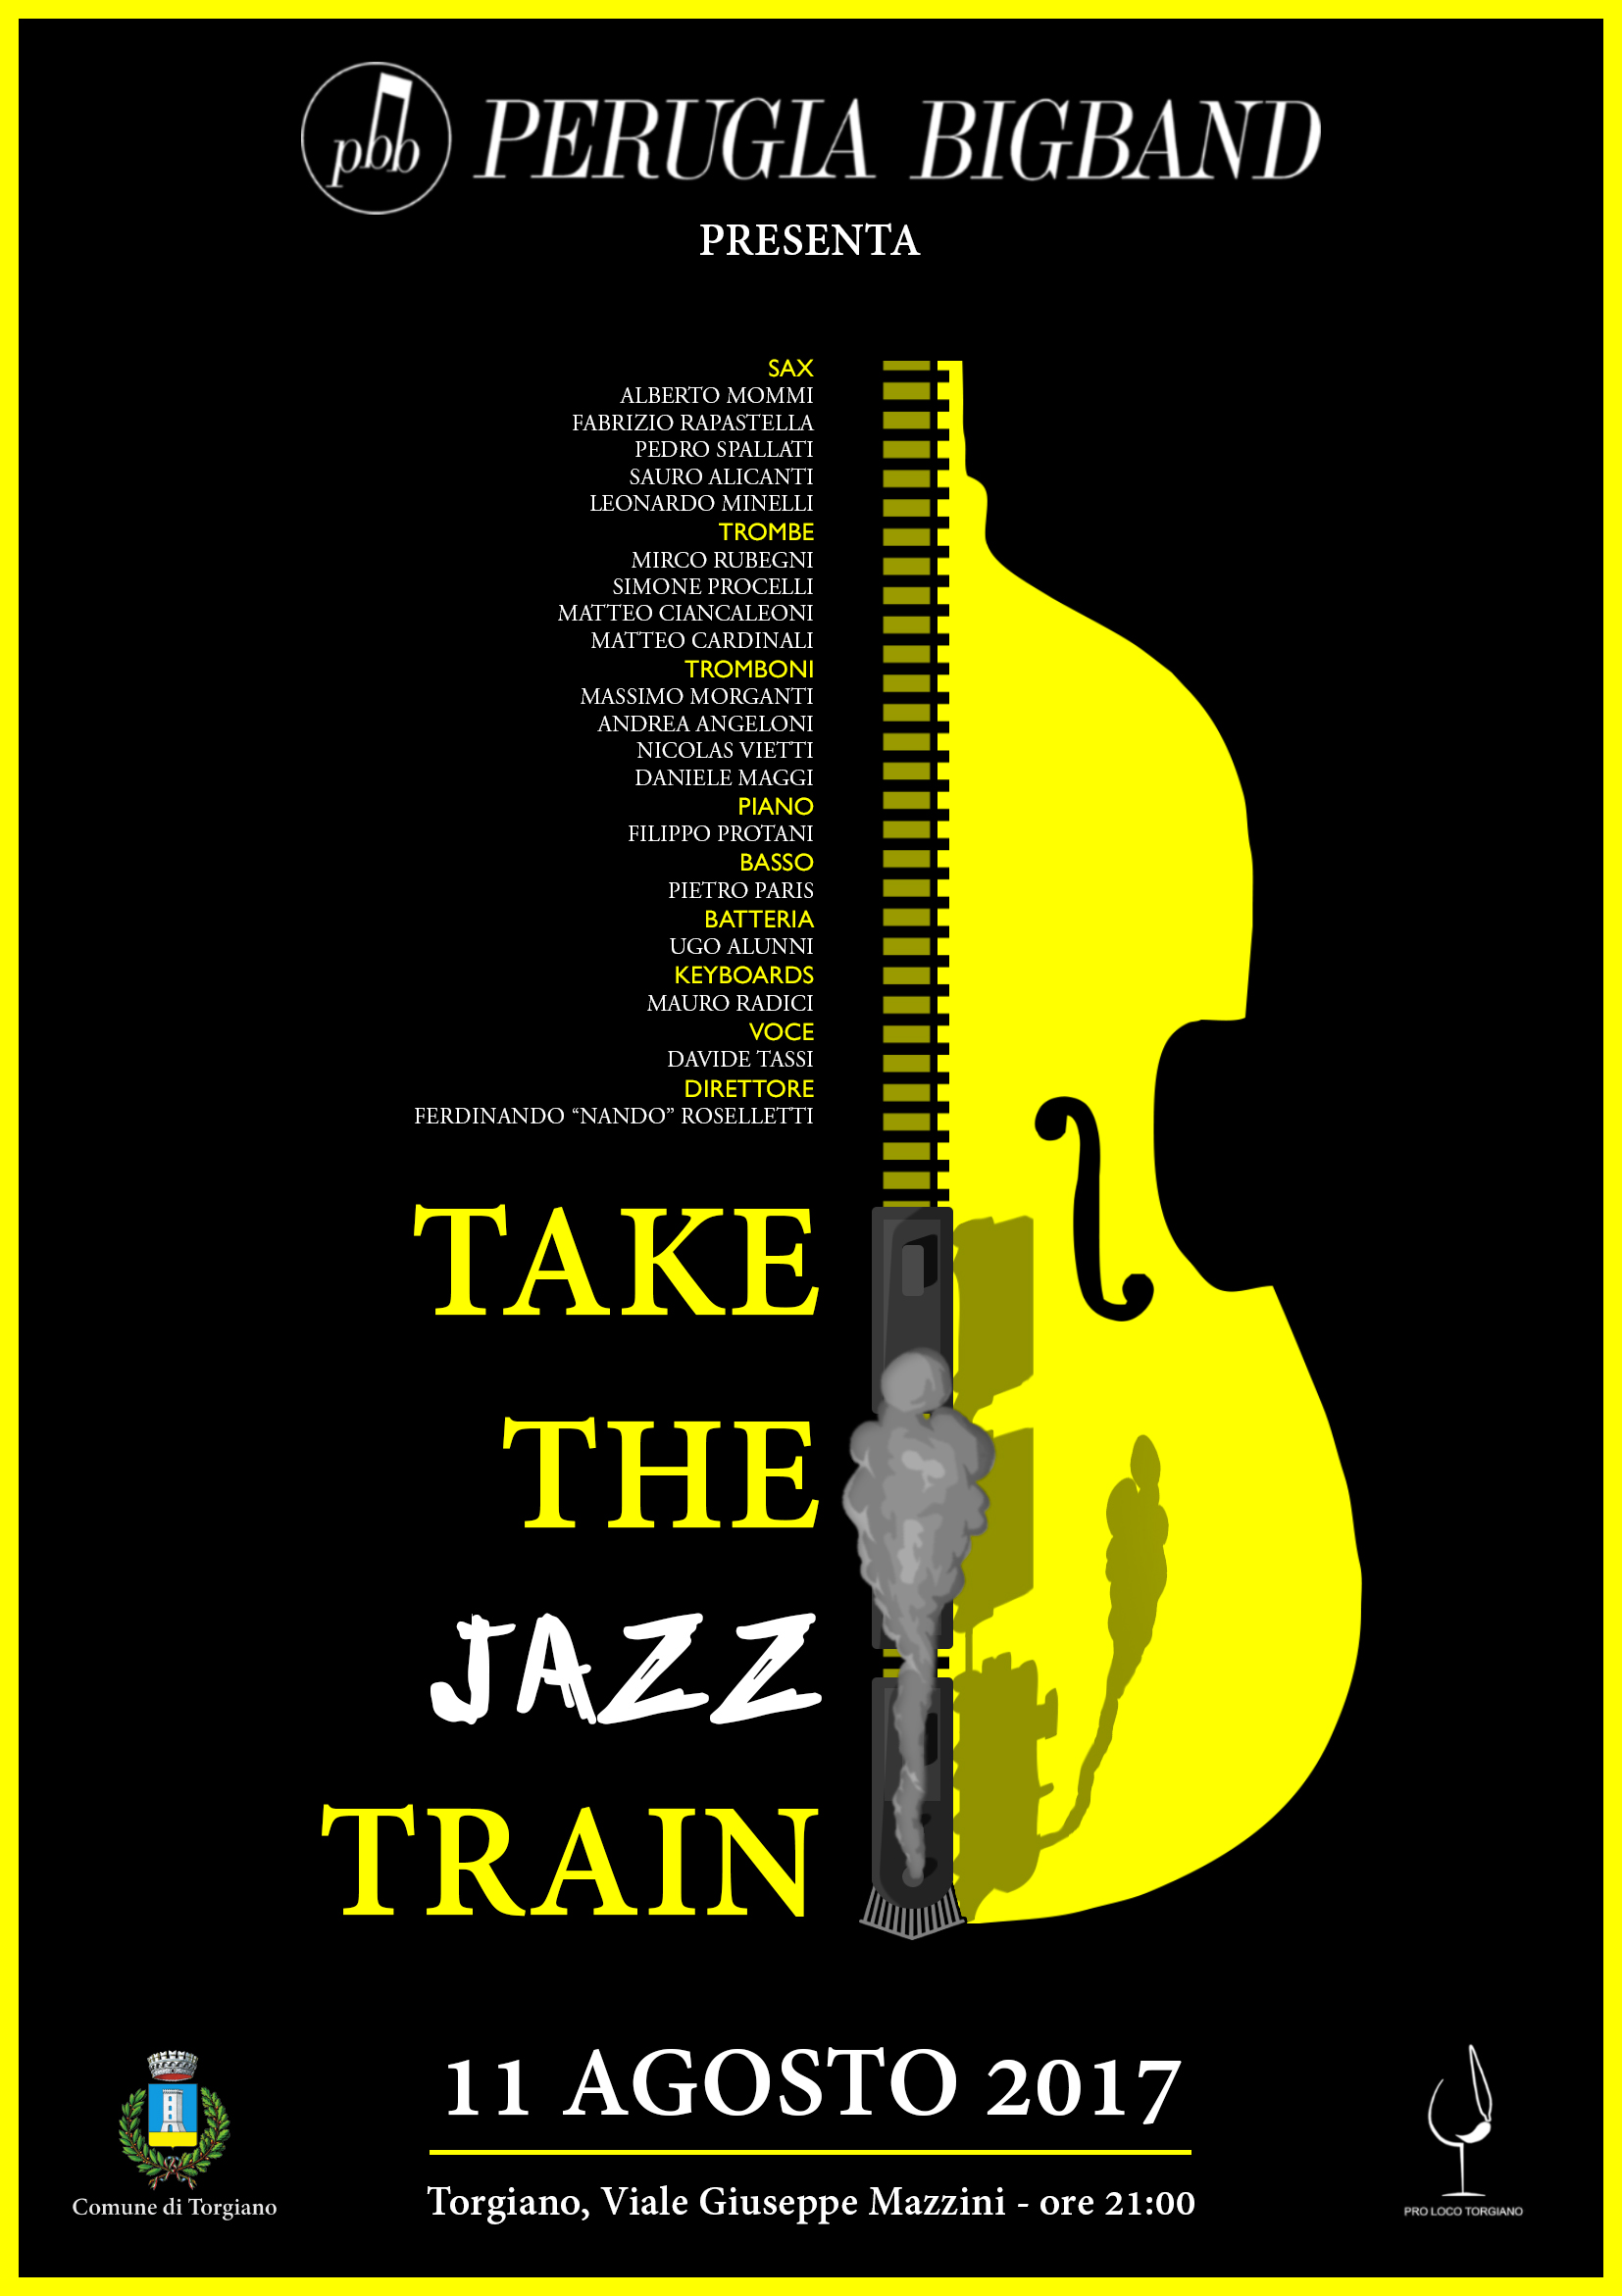 Perugia-BigBand-Torgiano-Take-The-Jazz-Train